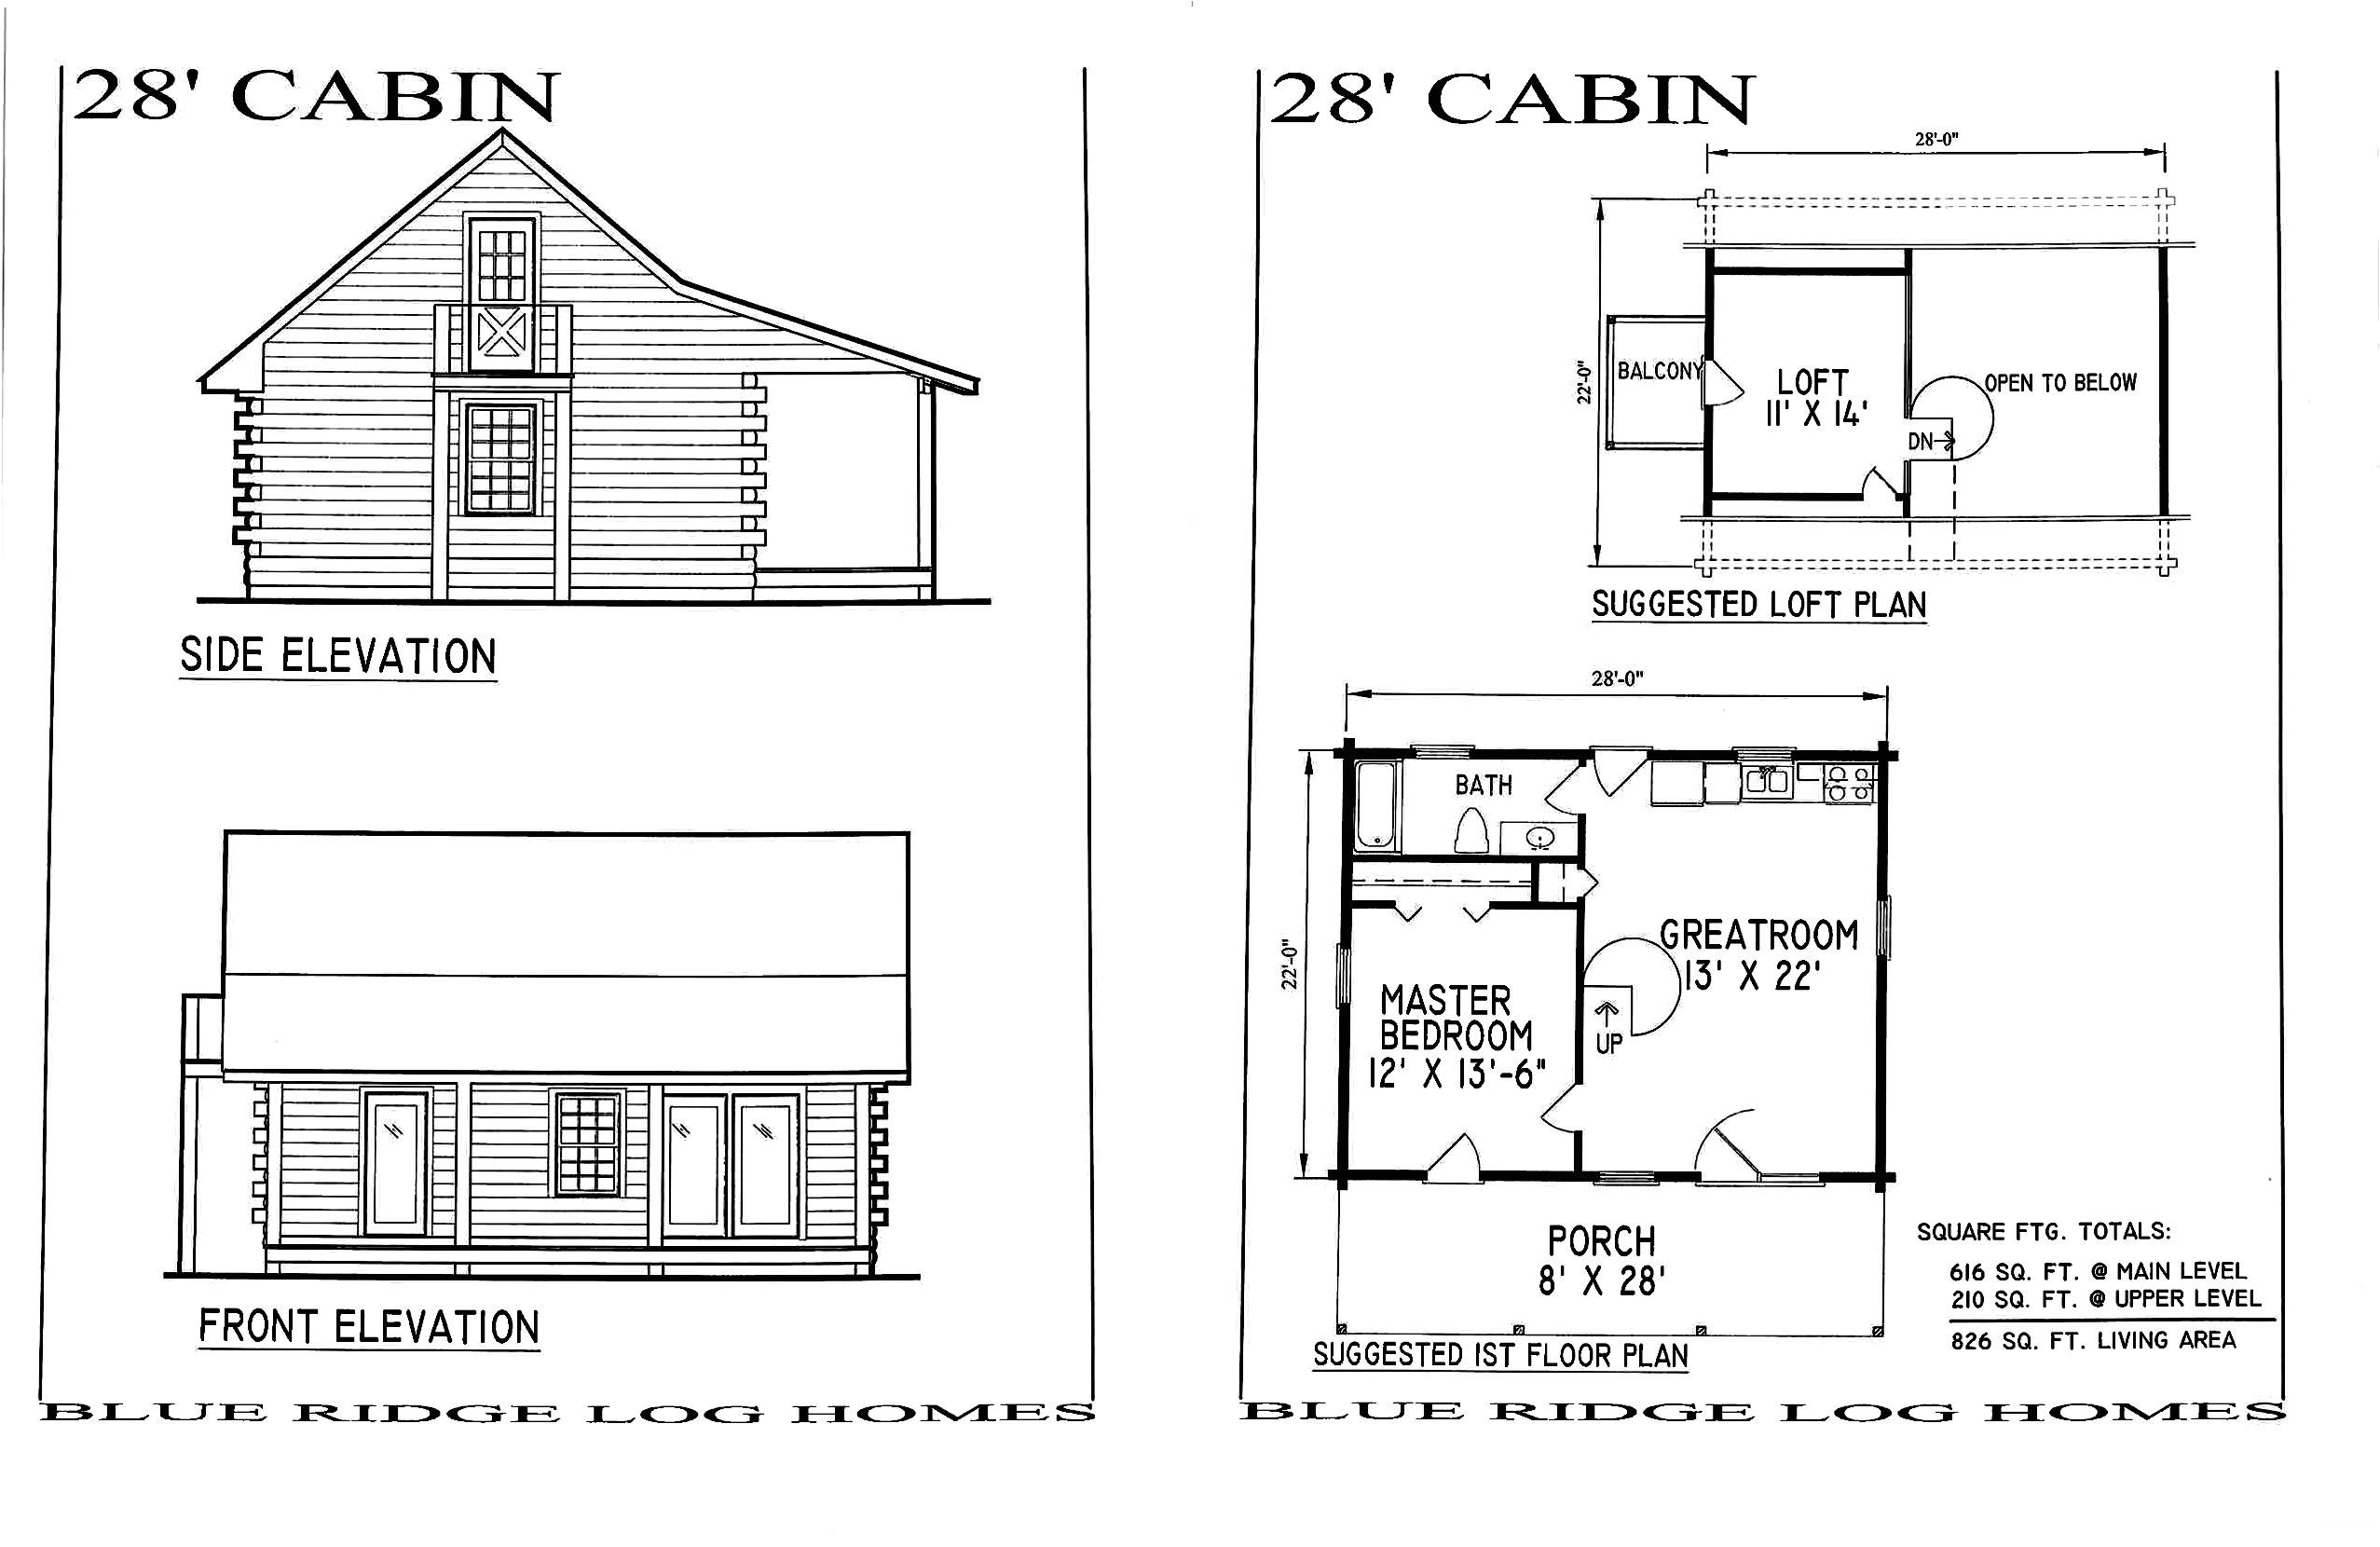 log cabin floor plans with walkout basement unique small house plans with loft canada home deco porches open floor plan pictures